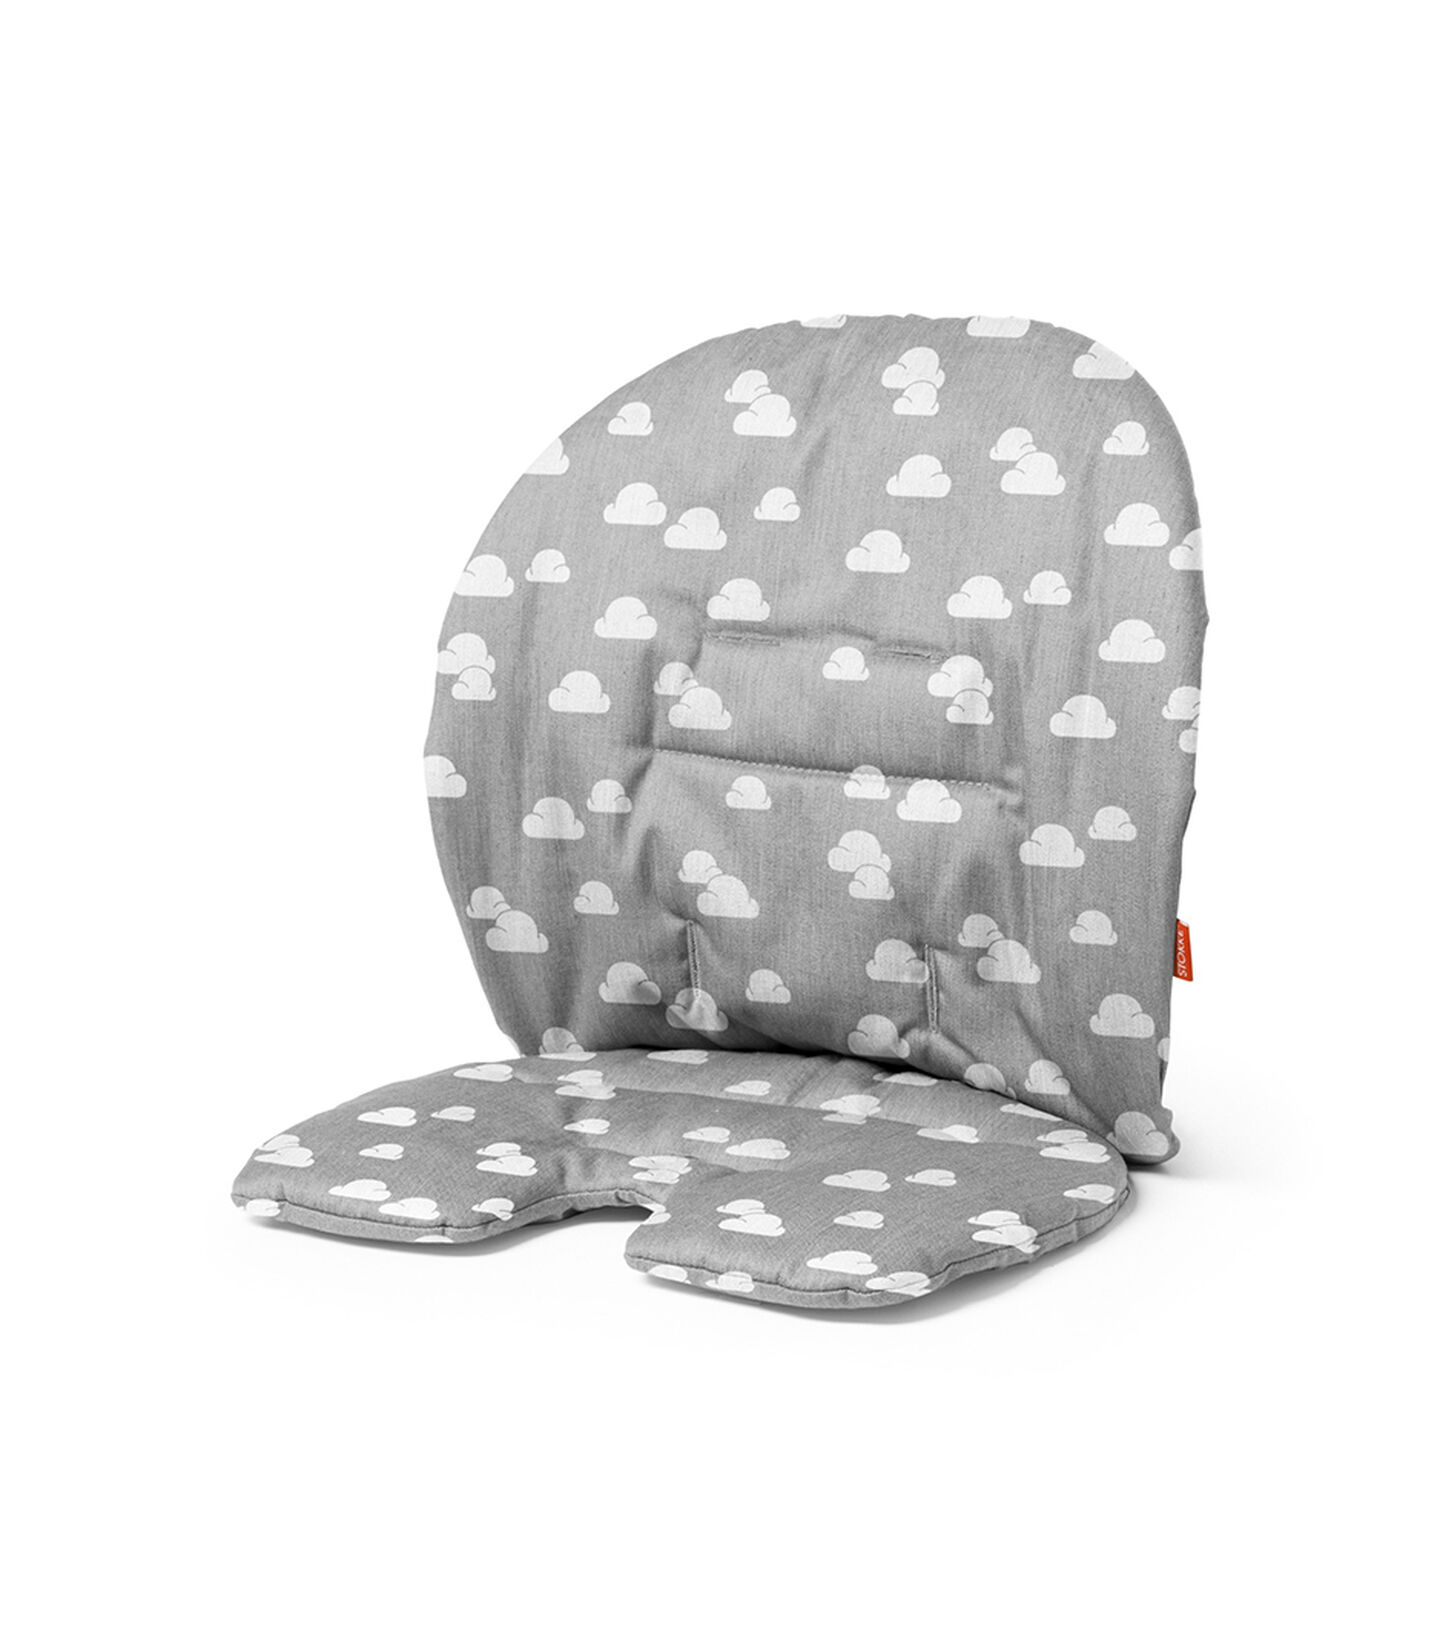 Pute til Stokke® Steps™ Baby Set Grey Clouds, Grey Clouds, mainview view 2